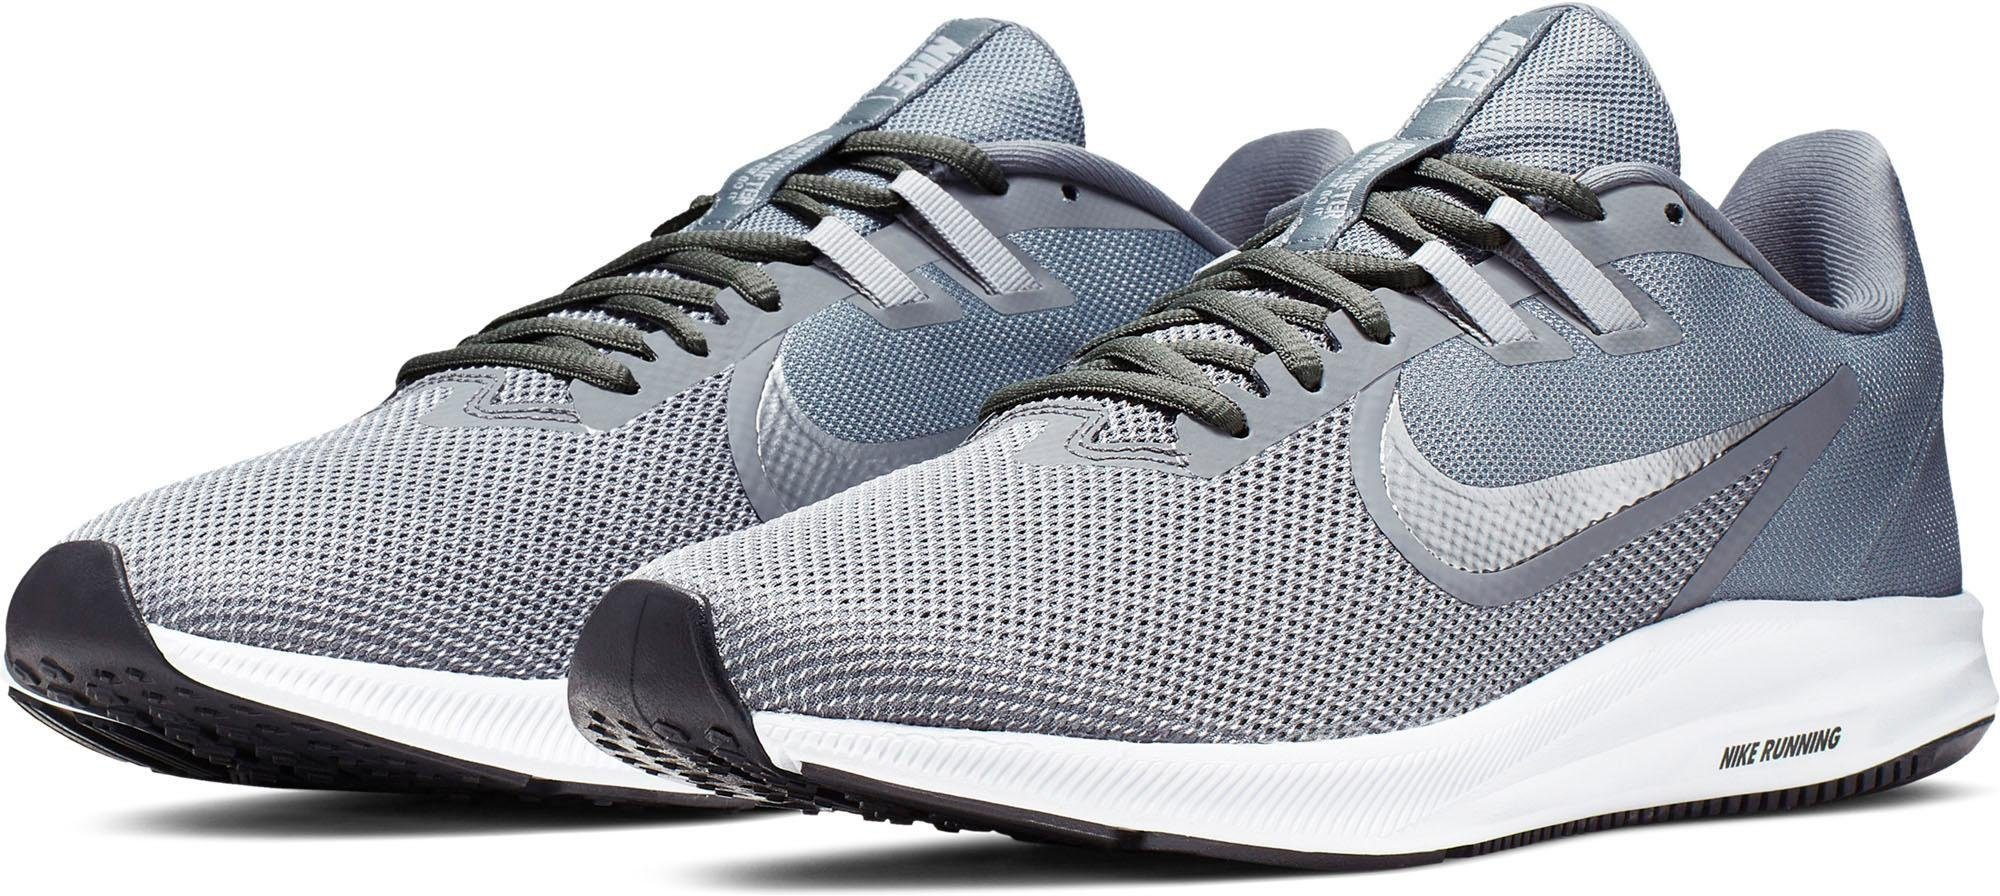 Nike »Downshifter 8« Laufschuh, Atmungsaktives Obermaterial aus Mesh online kaufen | OTTO